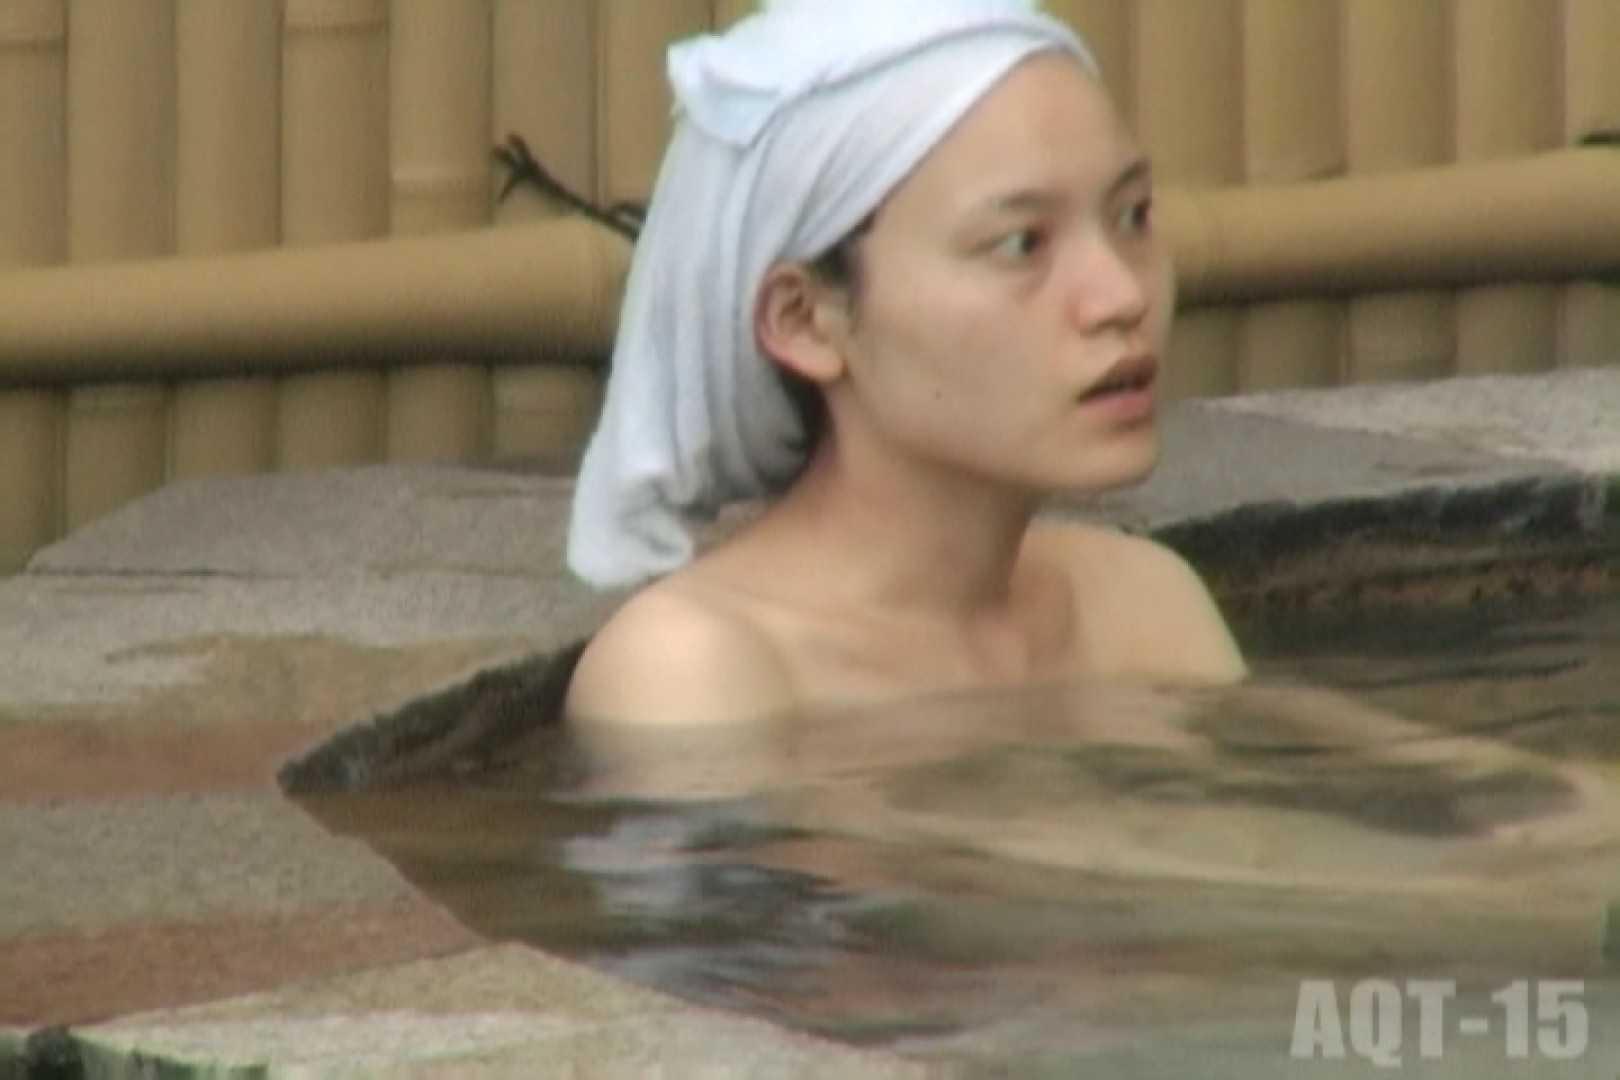 Aquaな露天風呂Vol.836 OLのエロ生活 オメコ動画キャプチャ 101連発 35